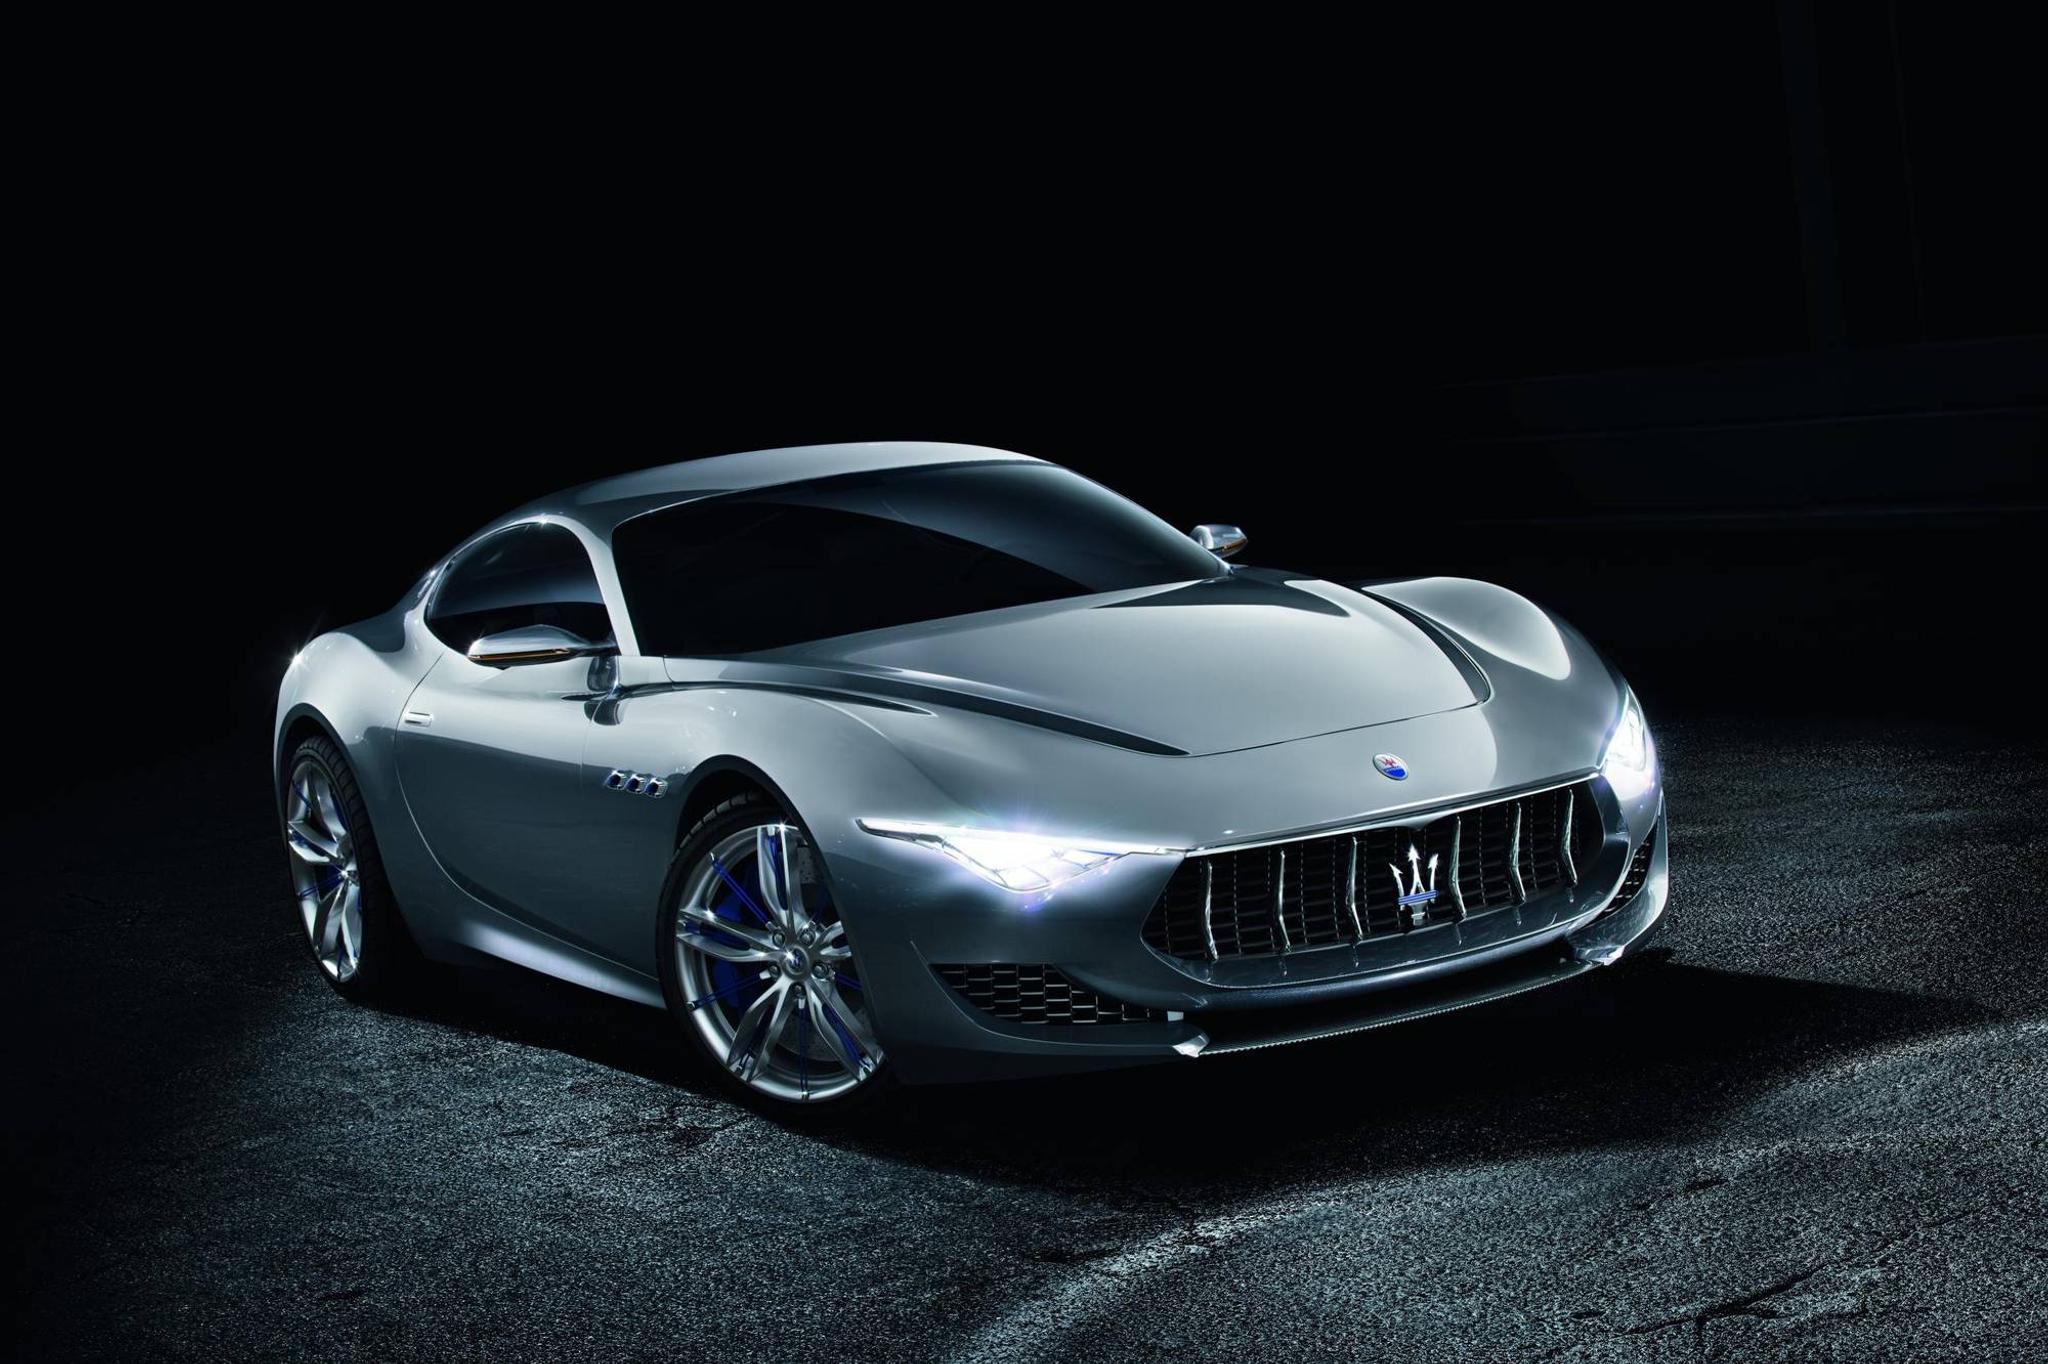 Maserati Alfieri Release Date >> Maserati Vahvisti Alfieri Tuotantoon Tuulilasi